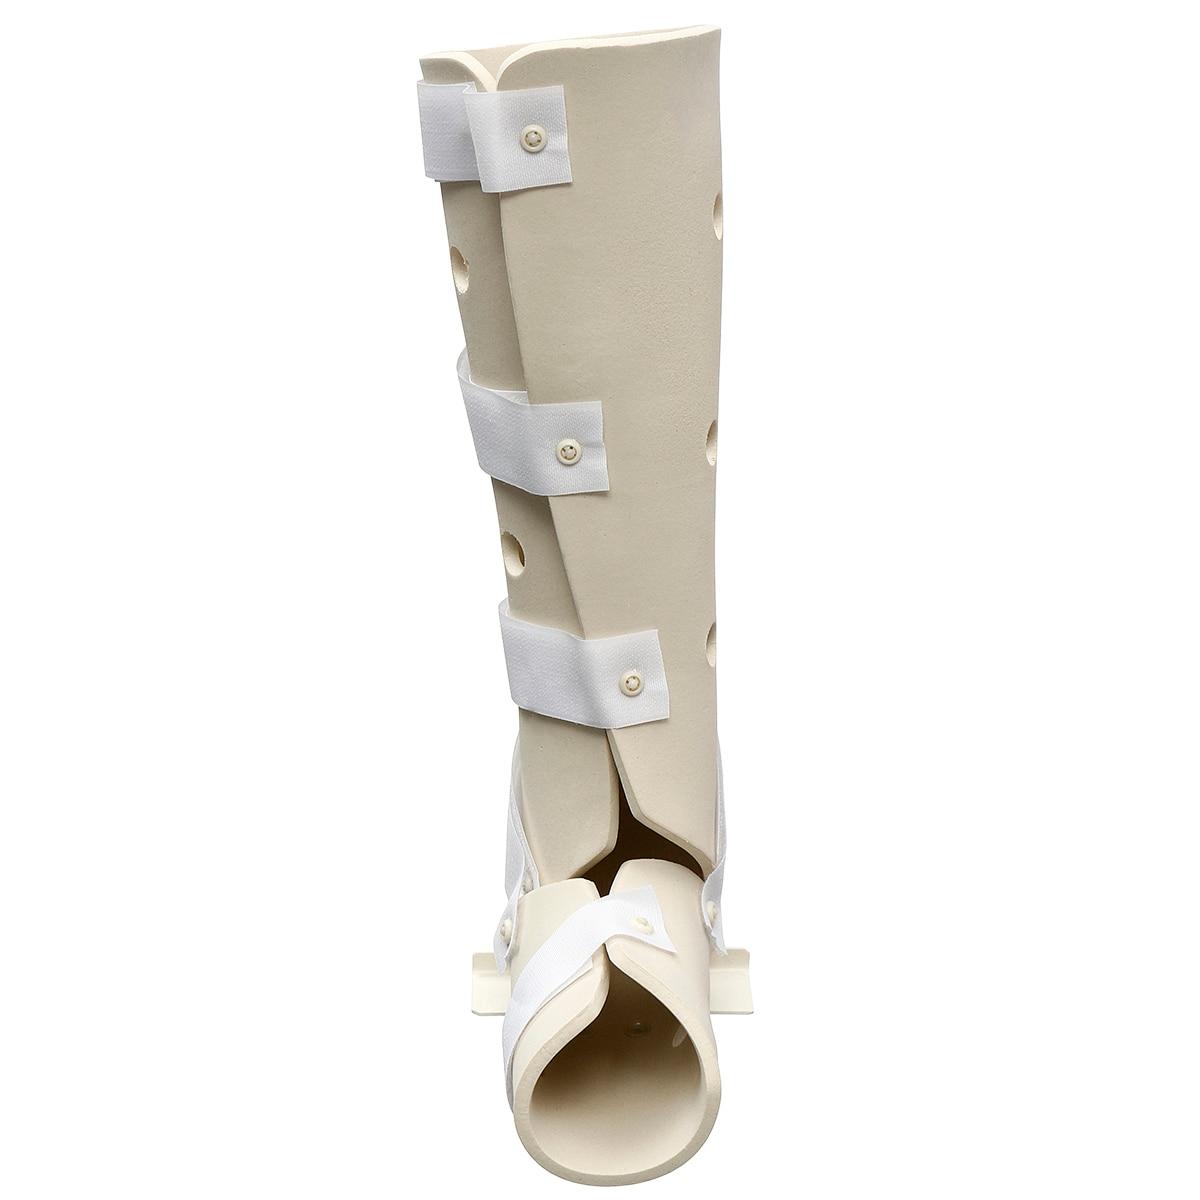 KIFIT 1Pcs Foam Soft Splint Boot Brace Ankle Support For Tendinitis Plantar Fasciitis Heel Spurs Fixed Orthotics Nursing Care